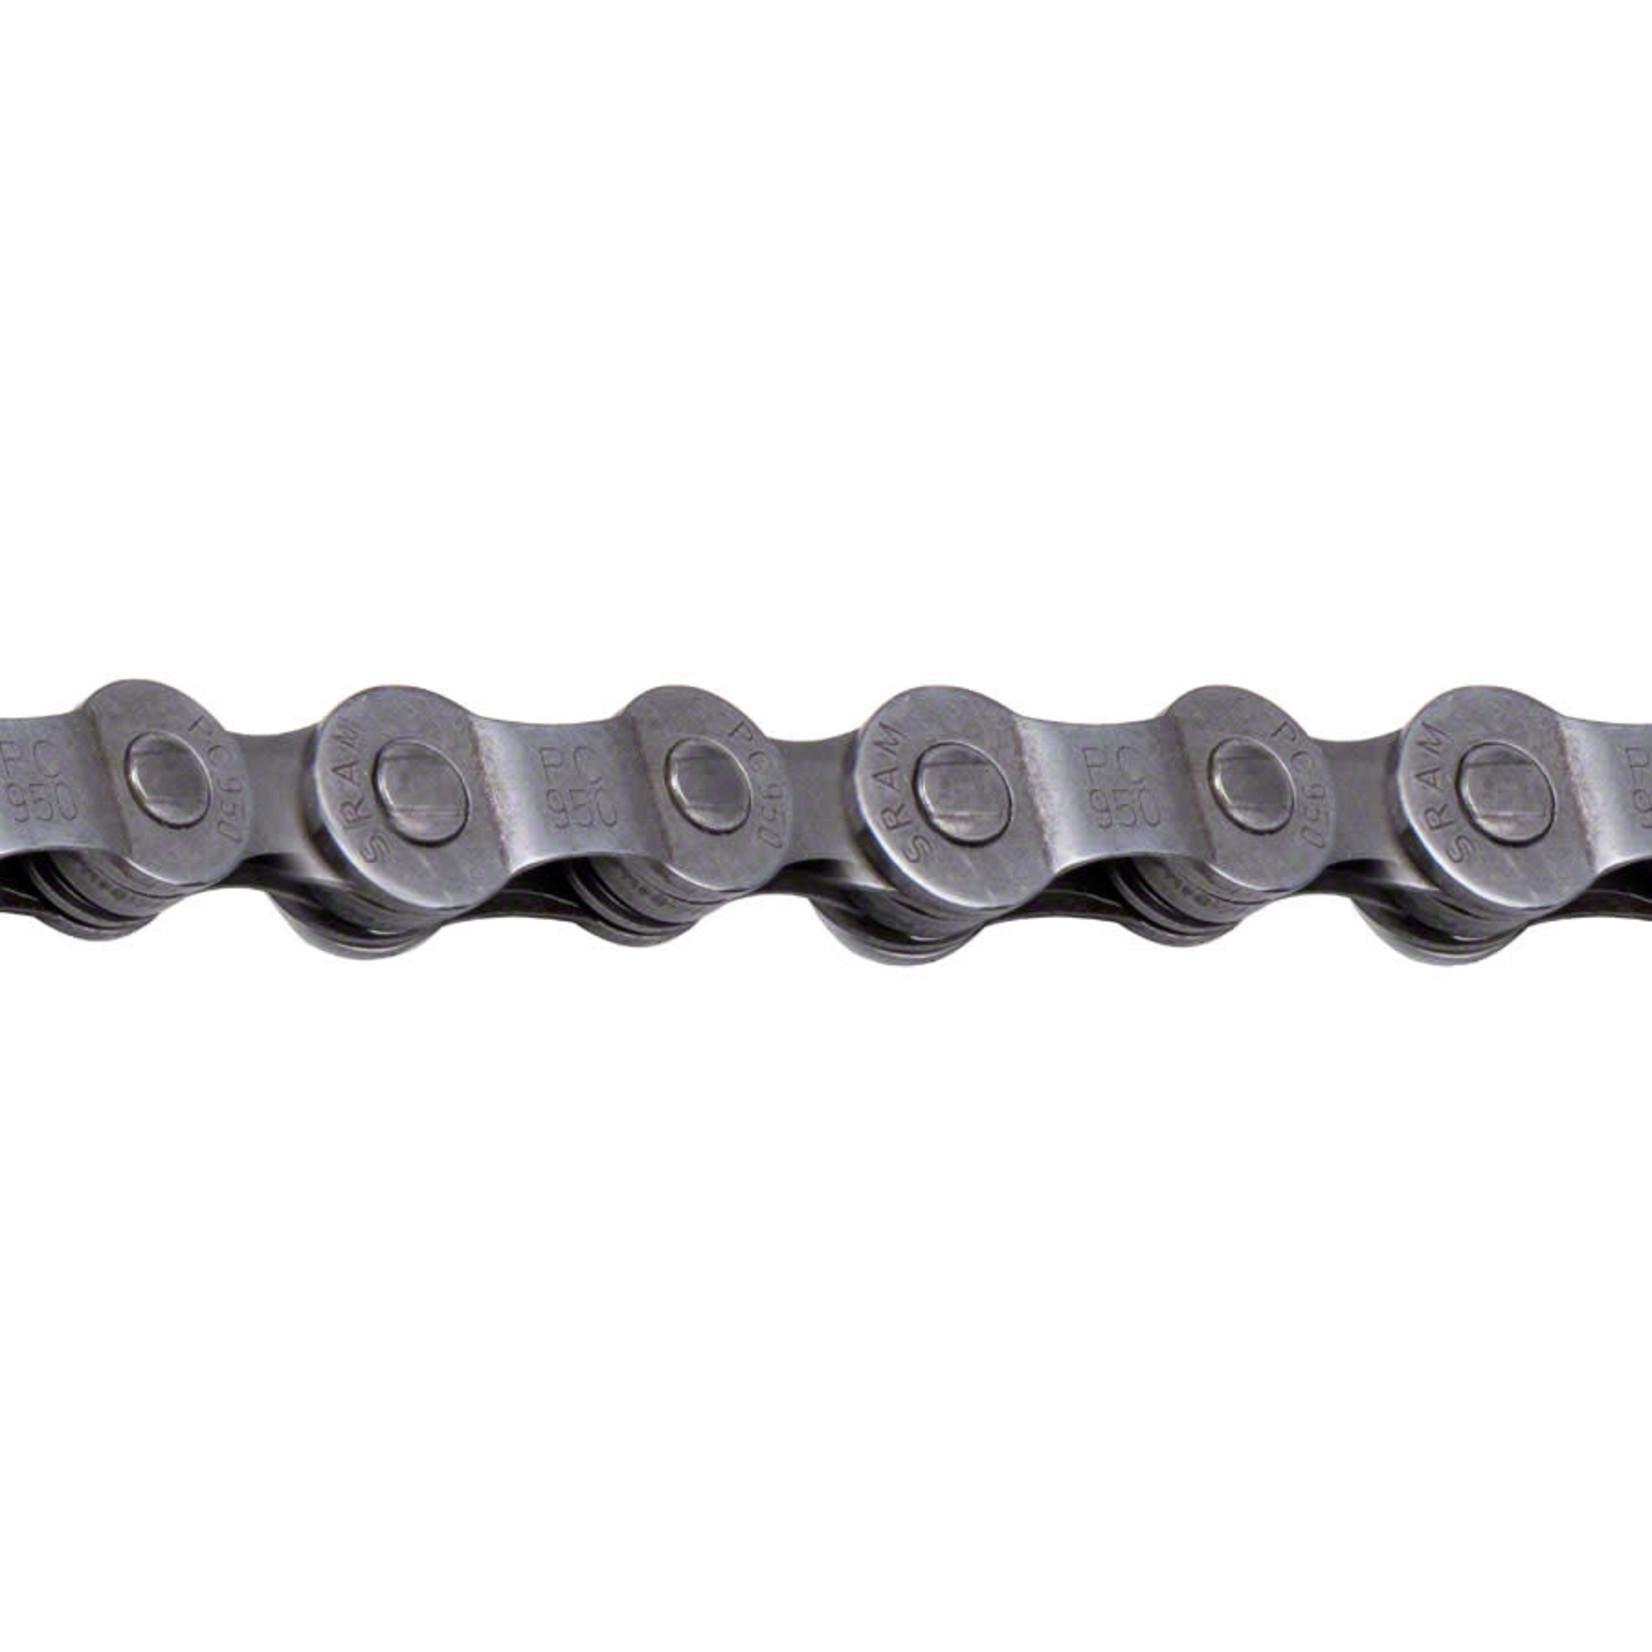 SRAM SRAM Chain PC-850 8 Speed 114L SILVER